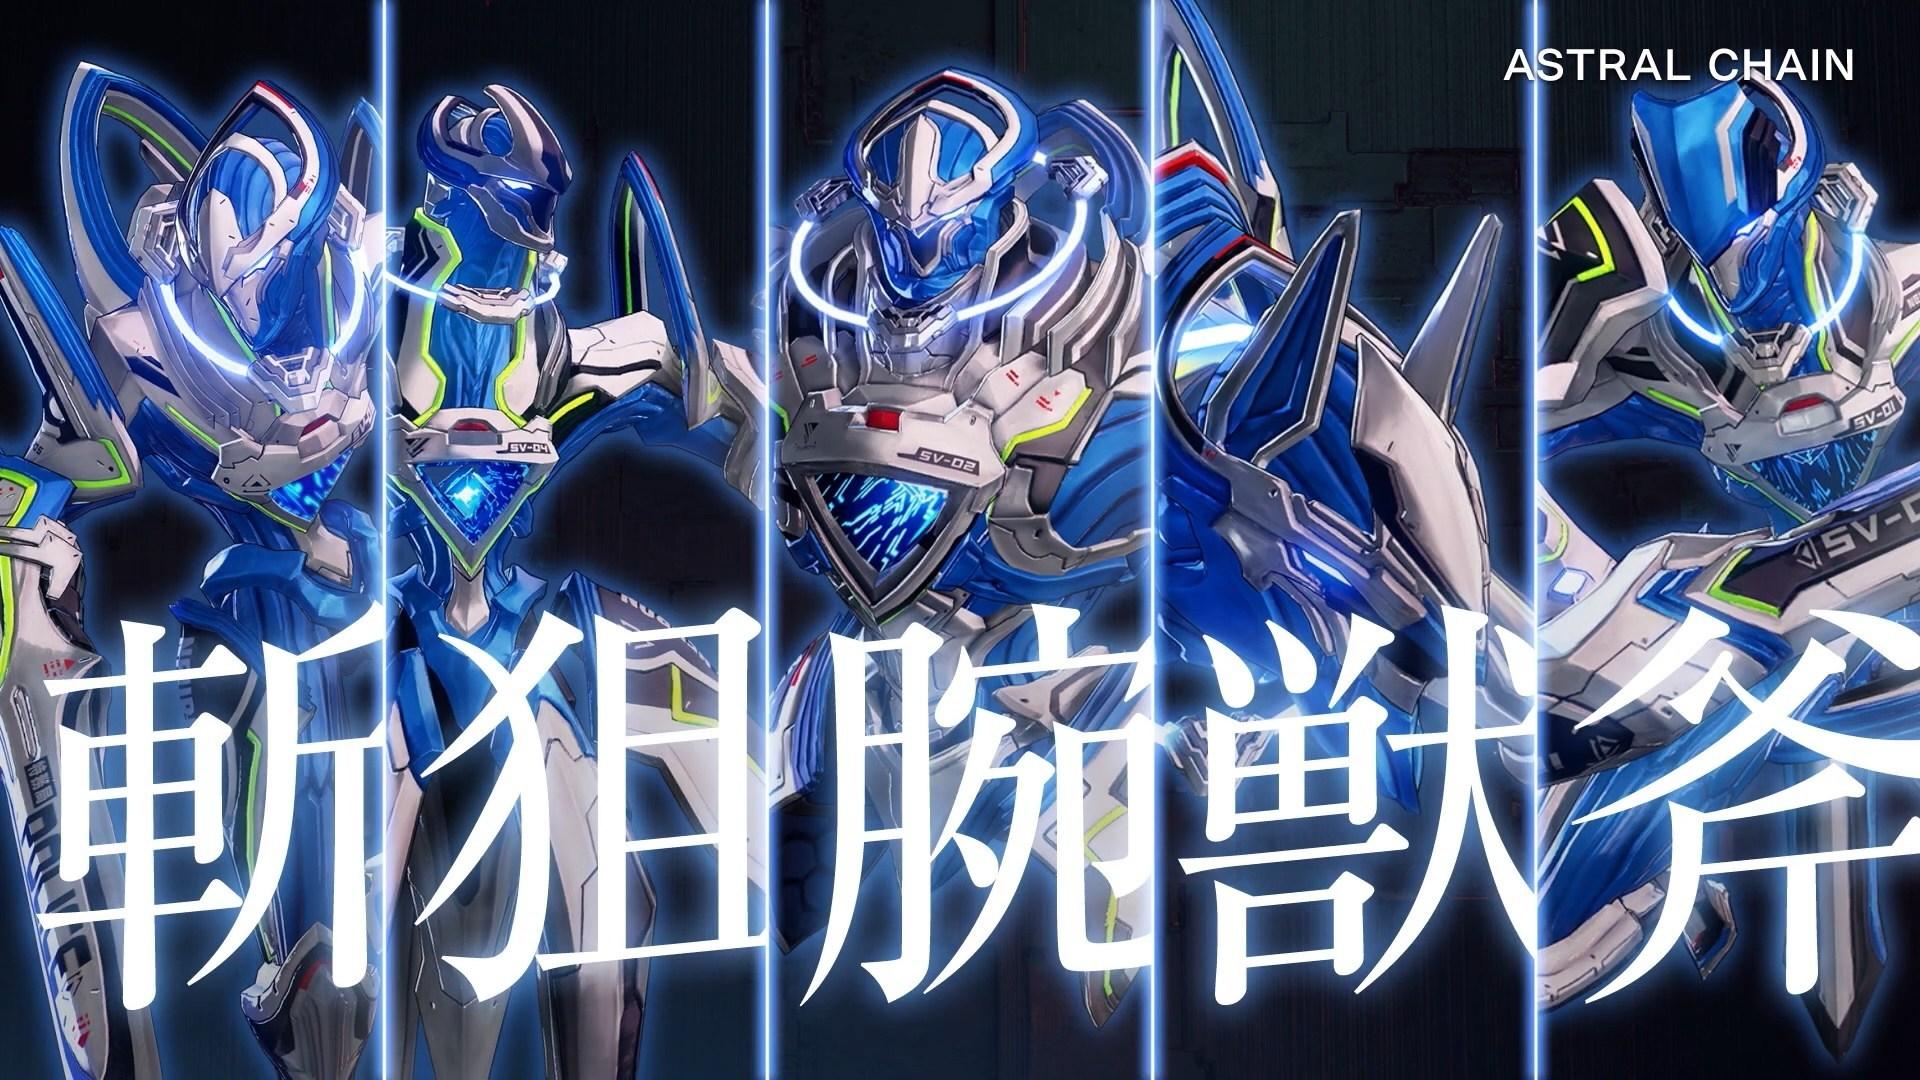 Astral chain legion